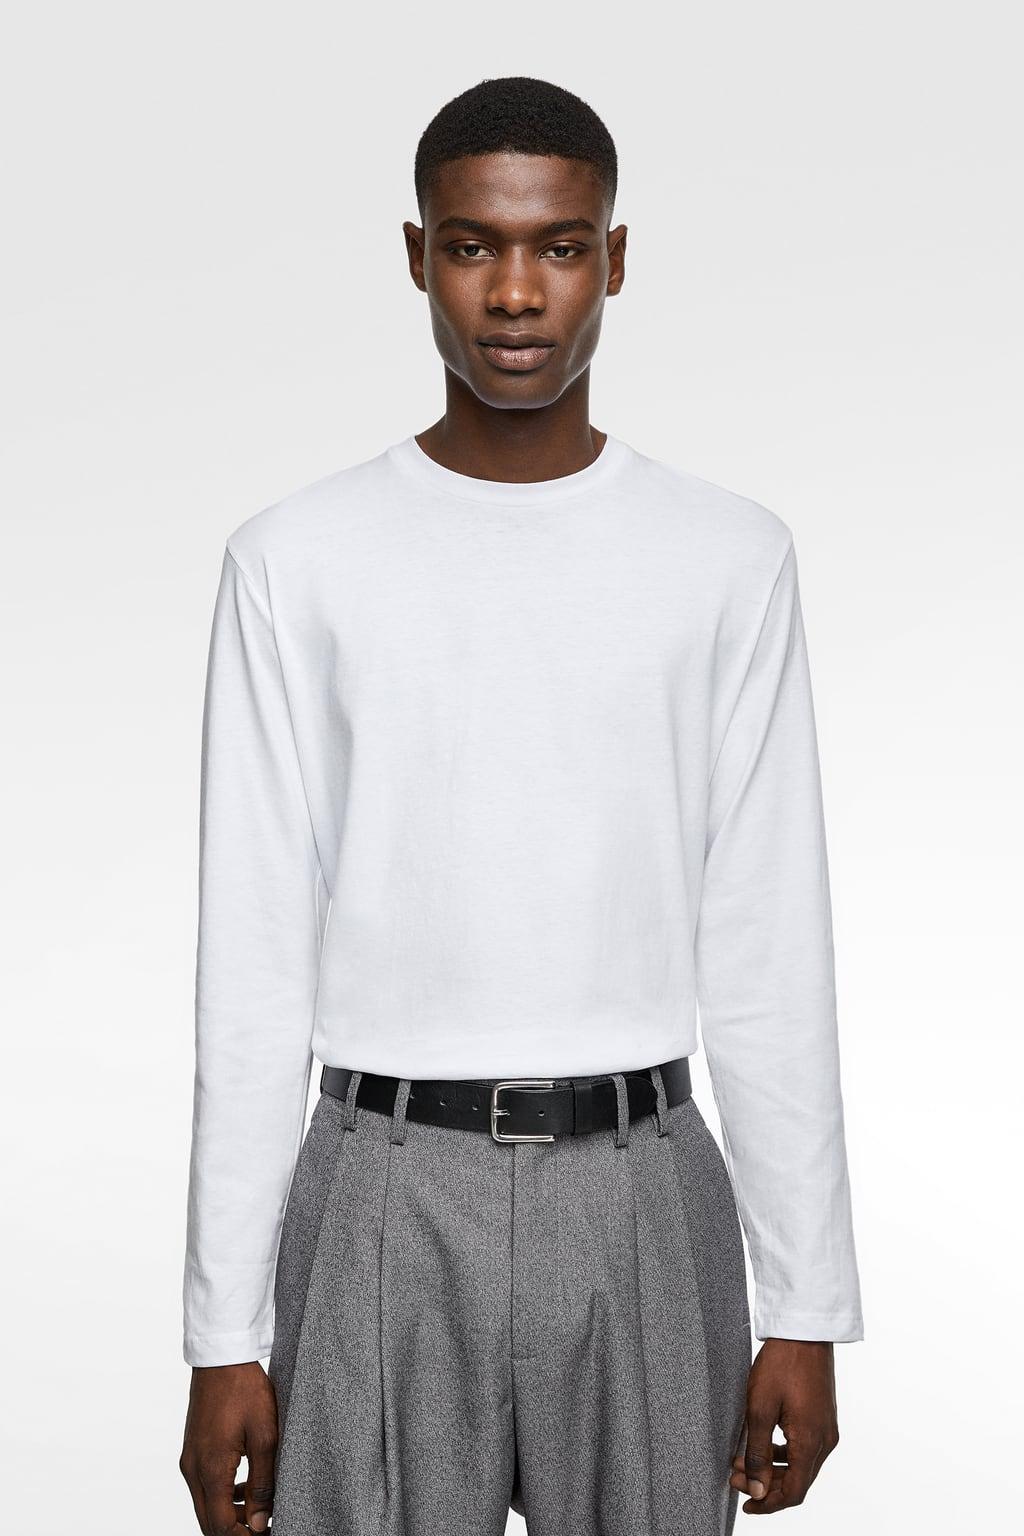 White Long-Sleeve from zara.com